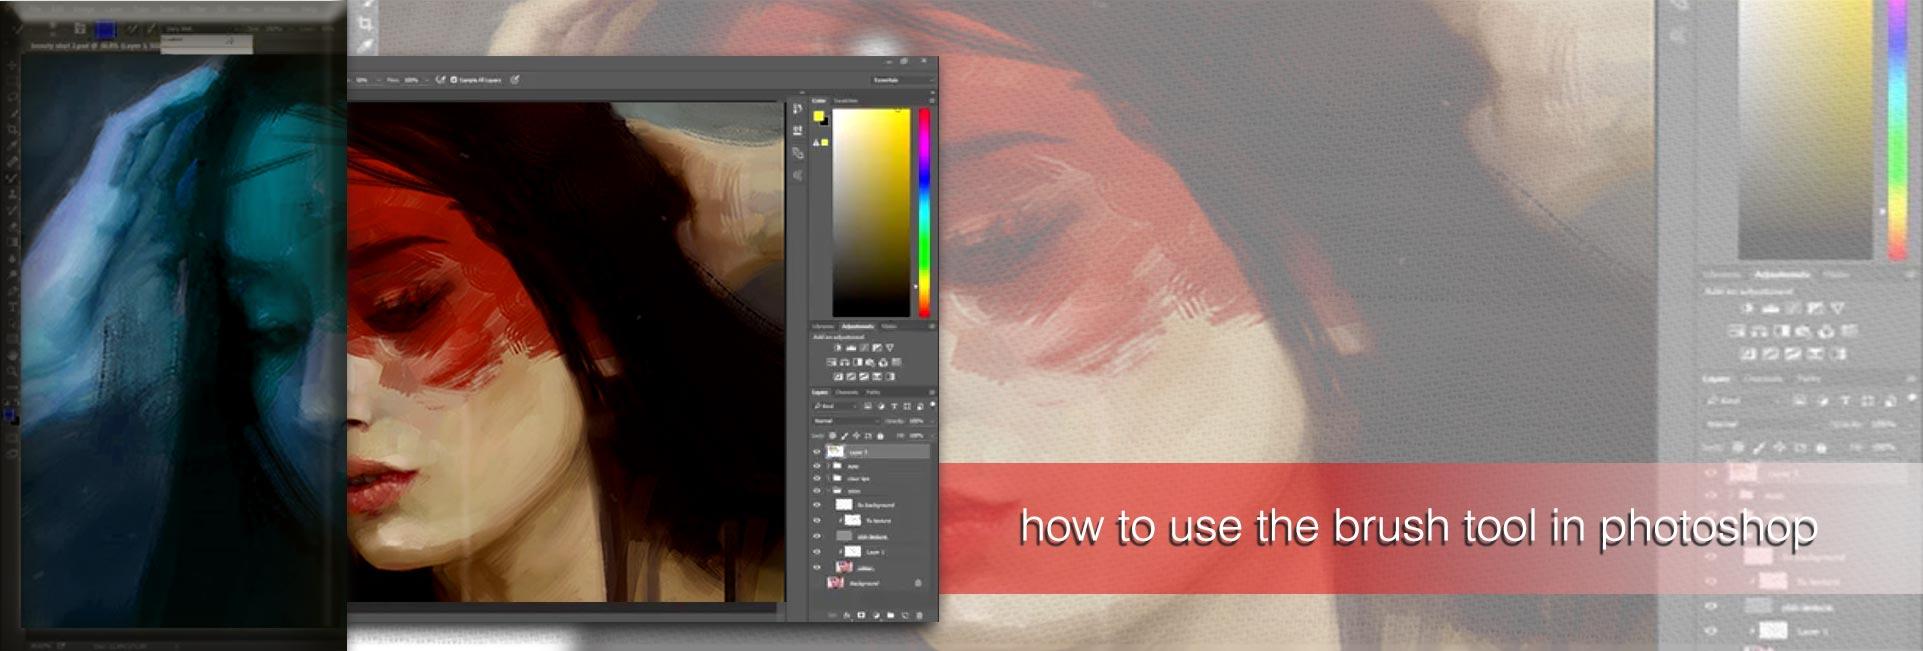 brush tool  photoshop1 - چگونه از ابزار براش در فتوشاپ استفاده کنیم